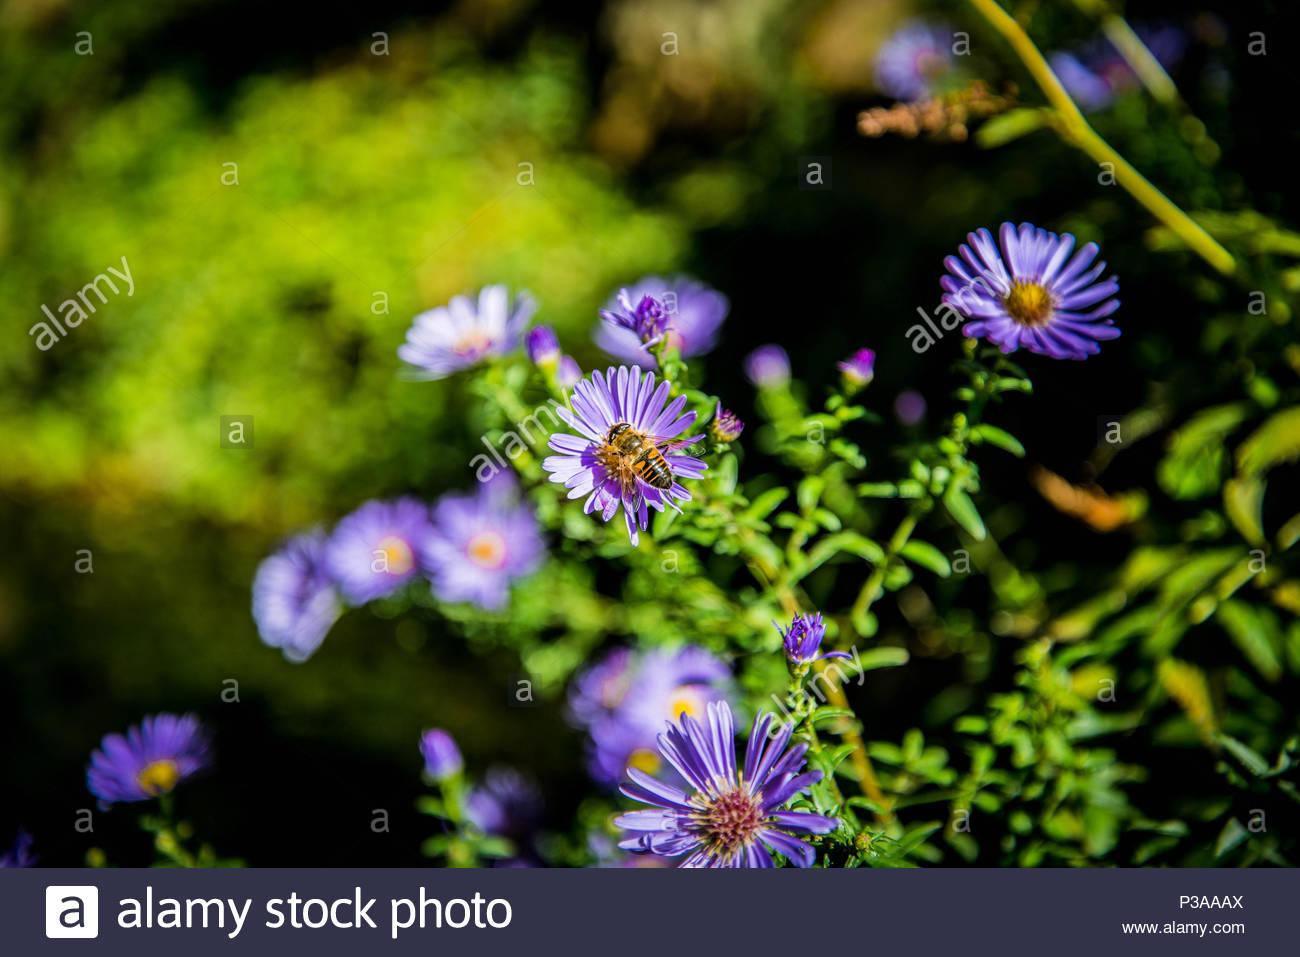 Spring flowers with bees in a beautiful garden stock photo spring flowers with bees in a beautiful garden mightylinksfo